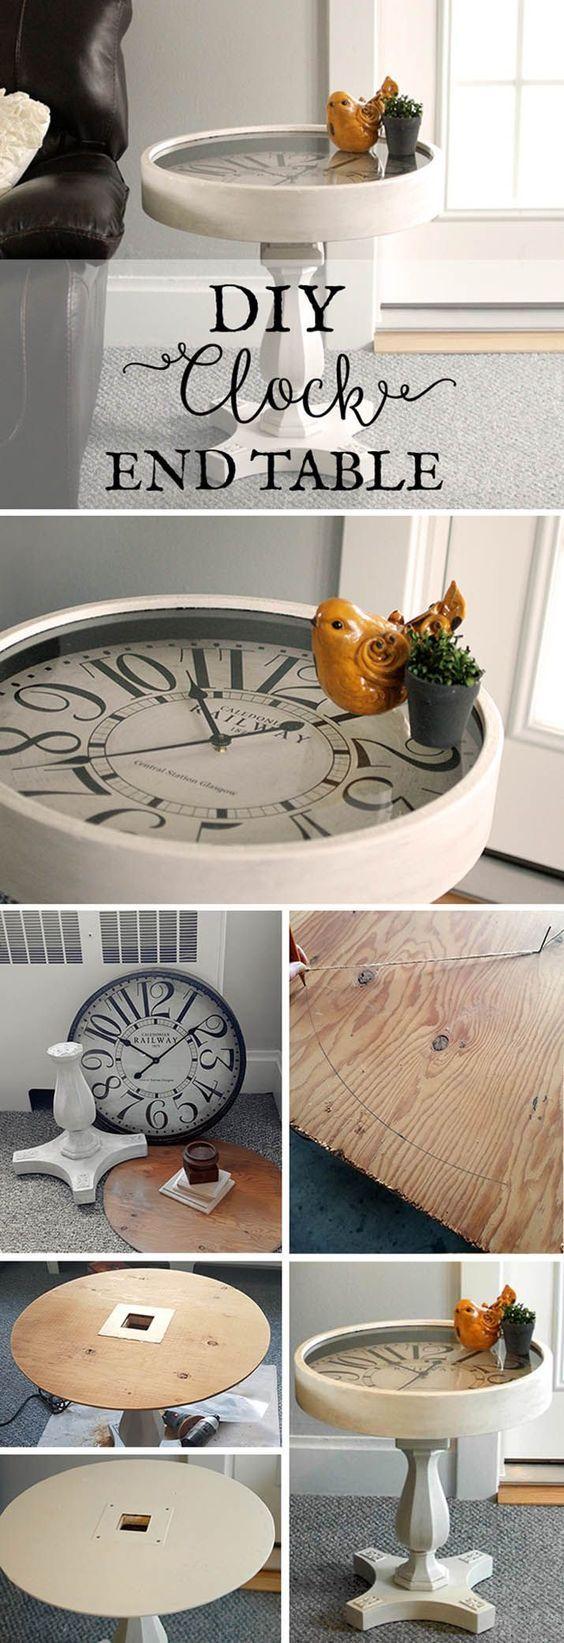 Mesita hecha con un reloj de pared